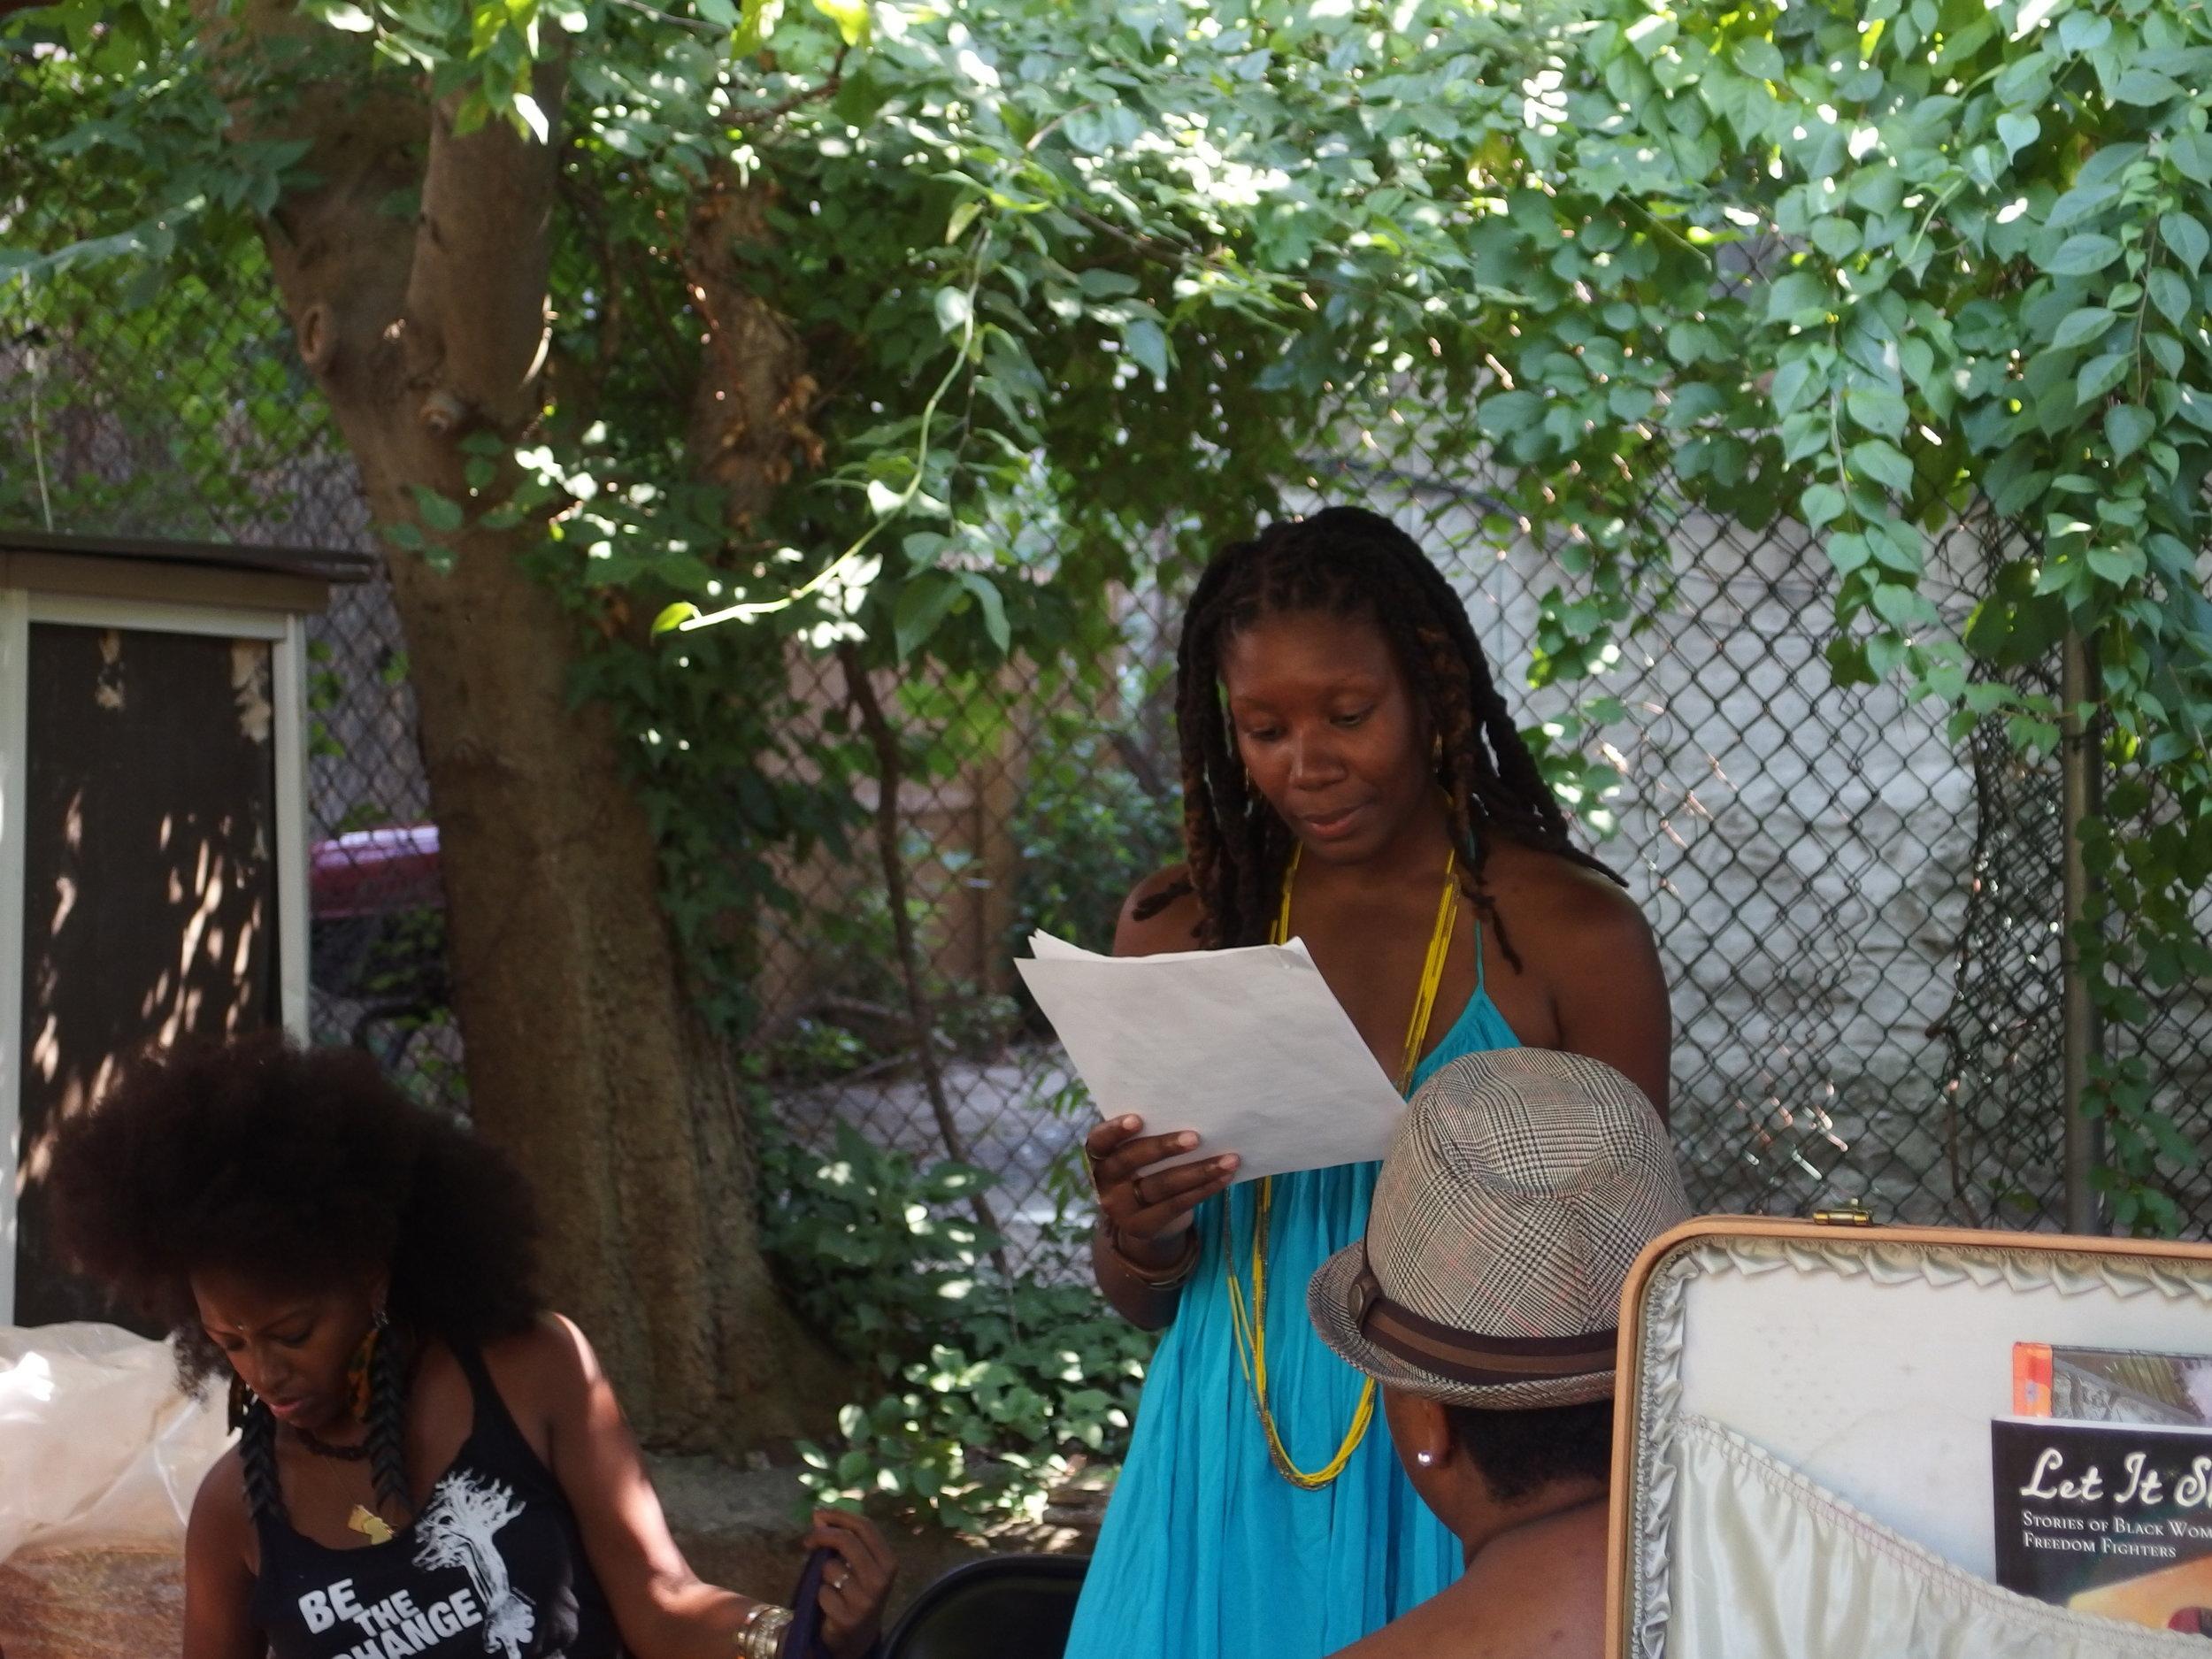 little-free-black-womens-library_20330082683_o.jpg